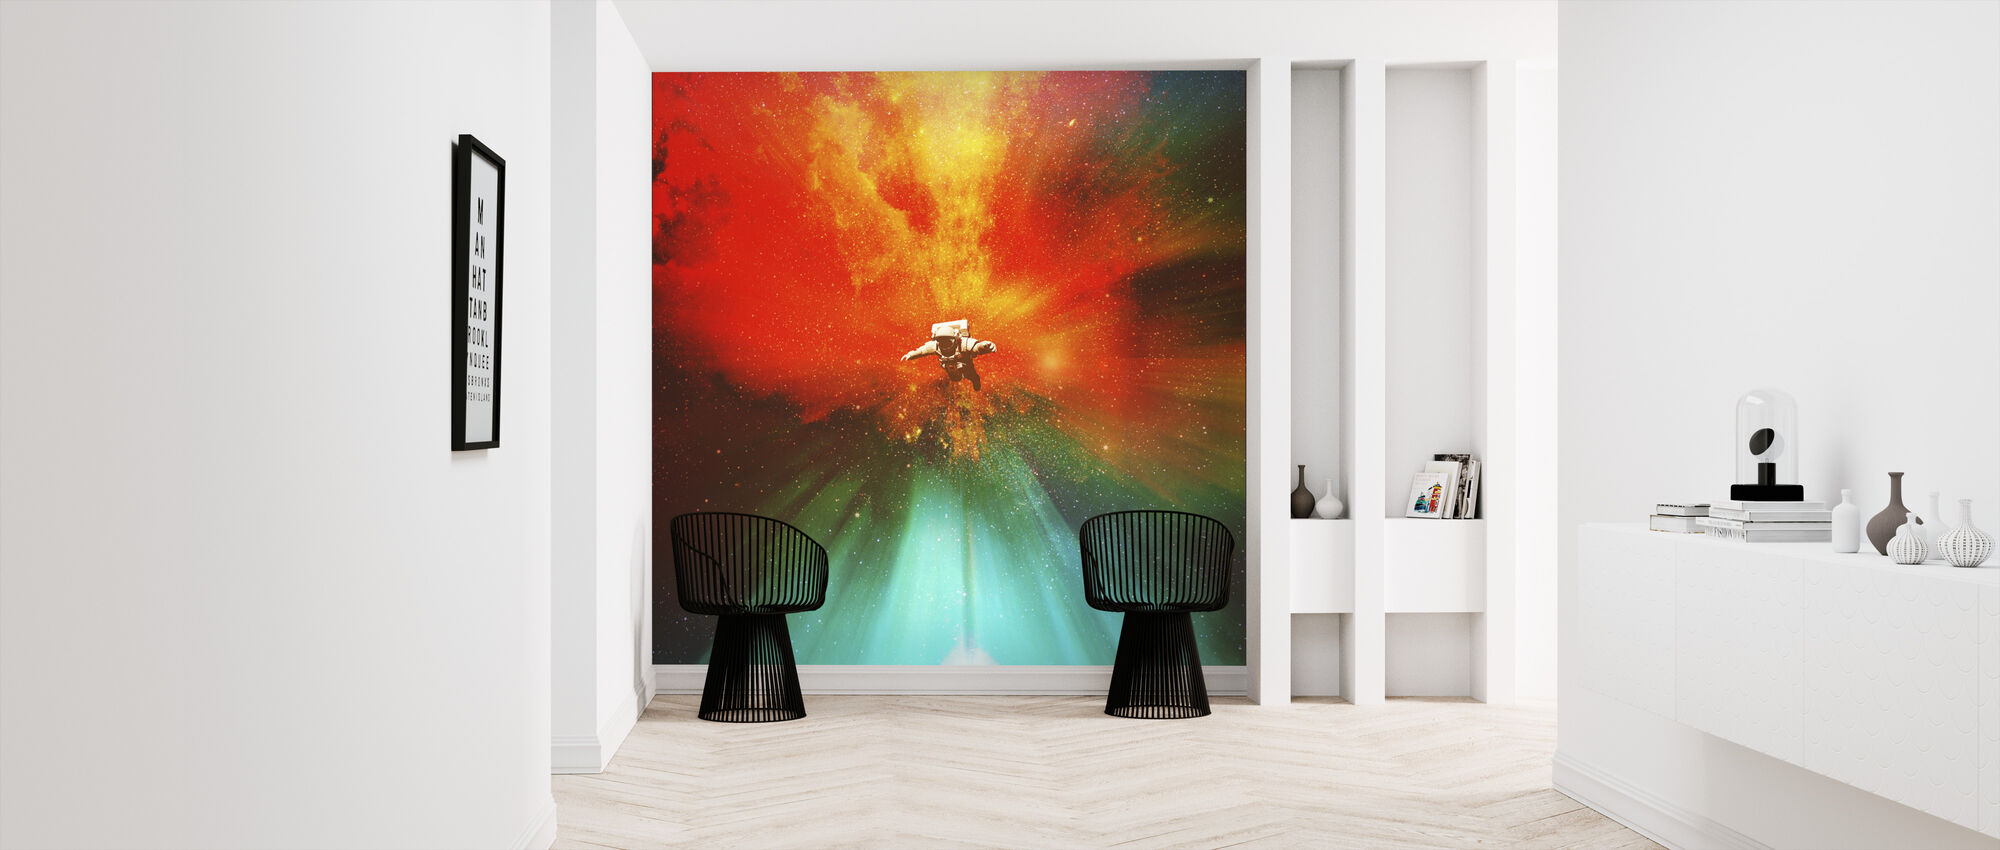 Stranded - Wallpaper - Hallway